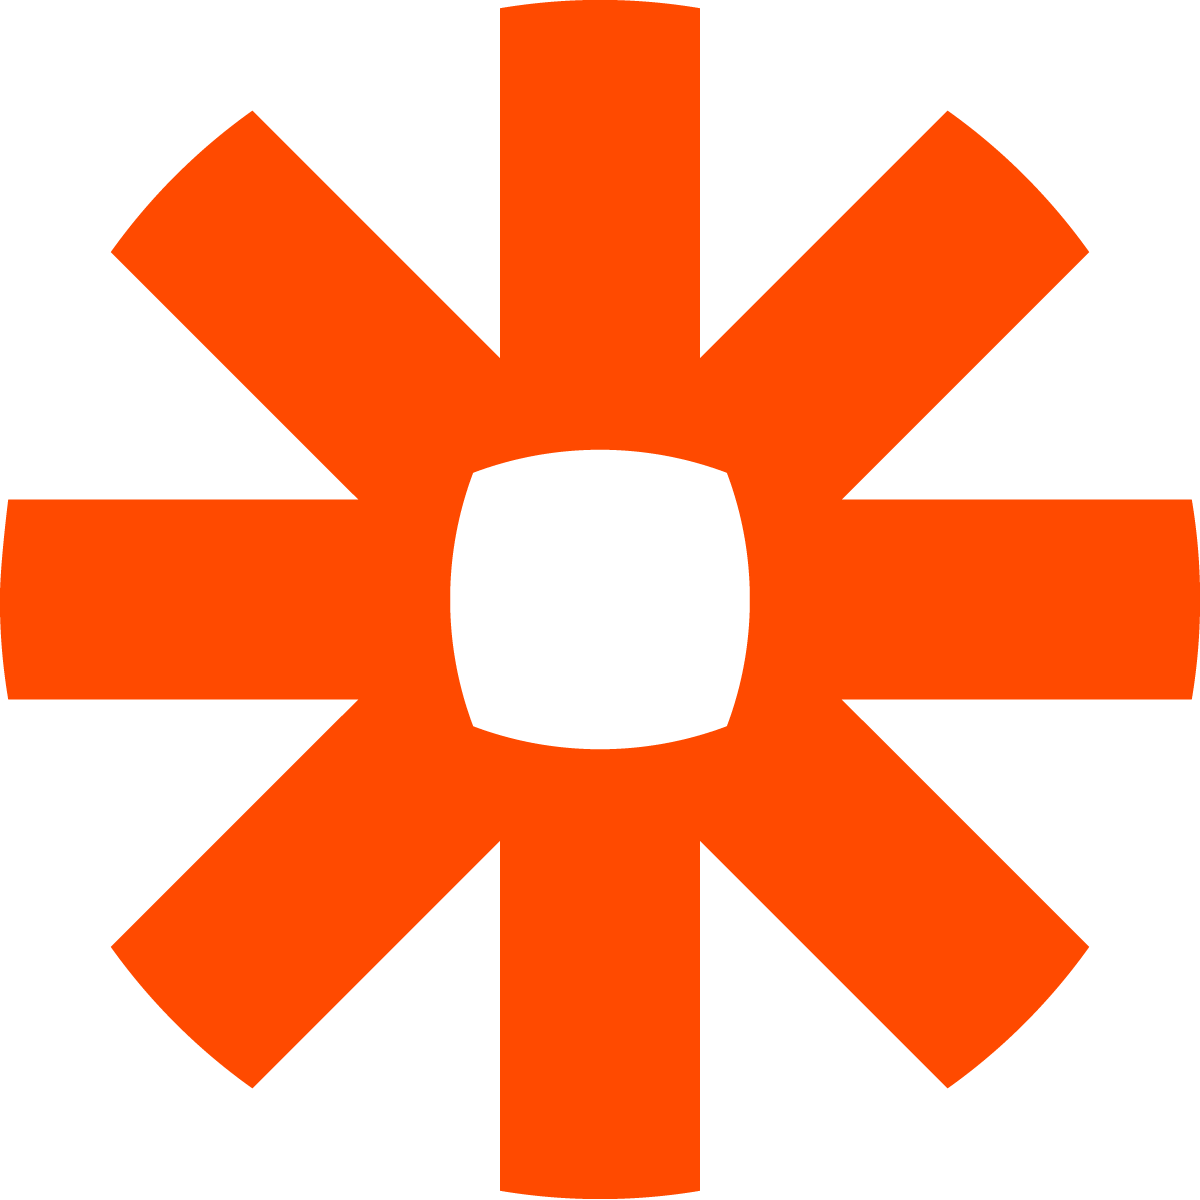 _brand_assets_images_logos_zapier-logomark